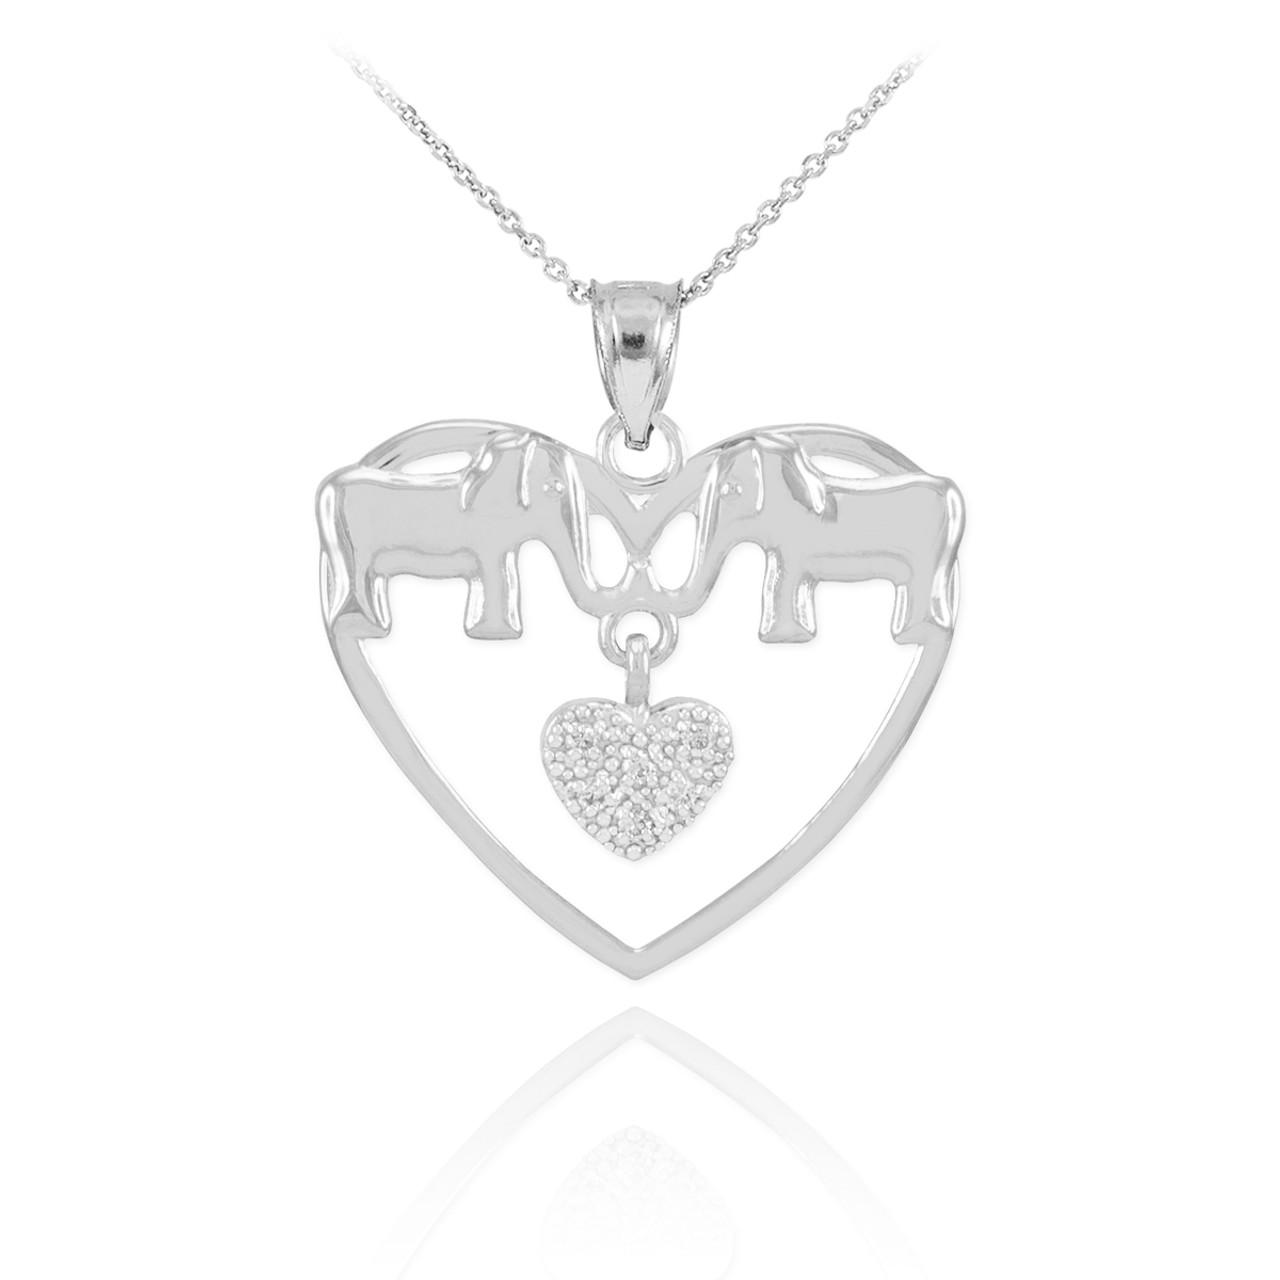 White gold elephant and heart pendant necklace with diamonds white gold elephant and heart pendant necklace aloadofball Choice Image